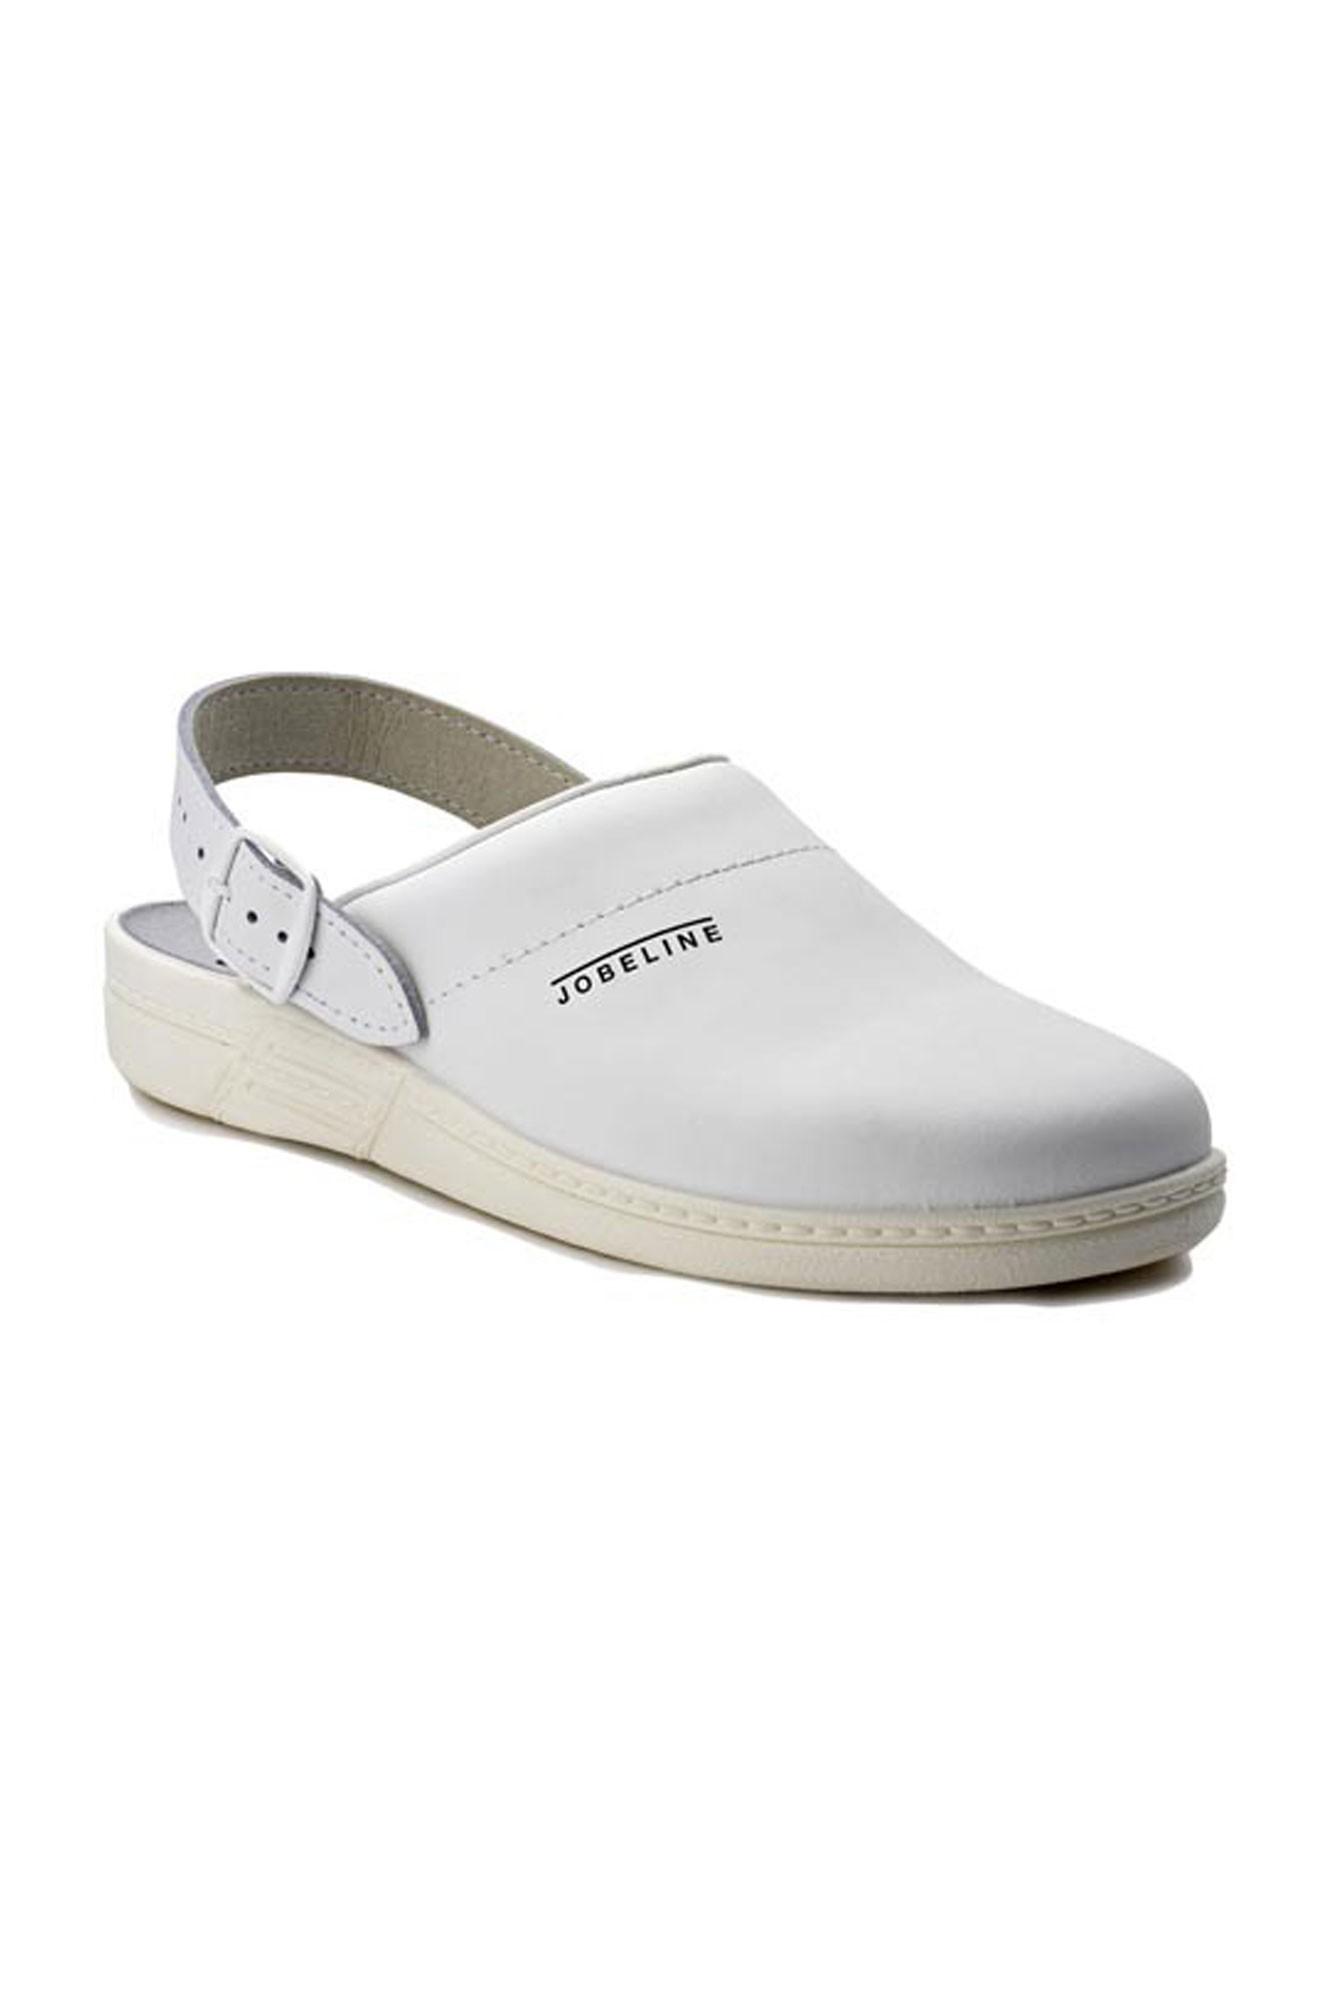 Kuchařské pantofle Haiti - bílá